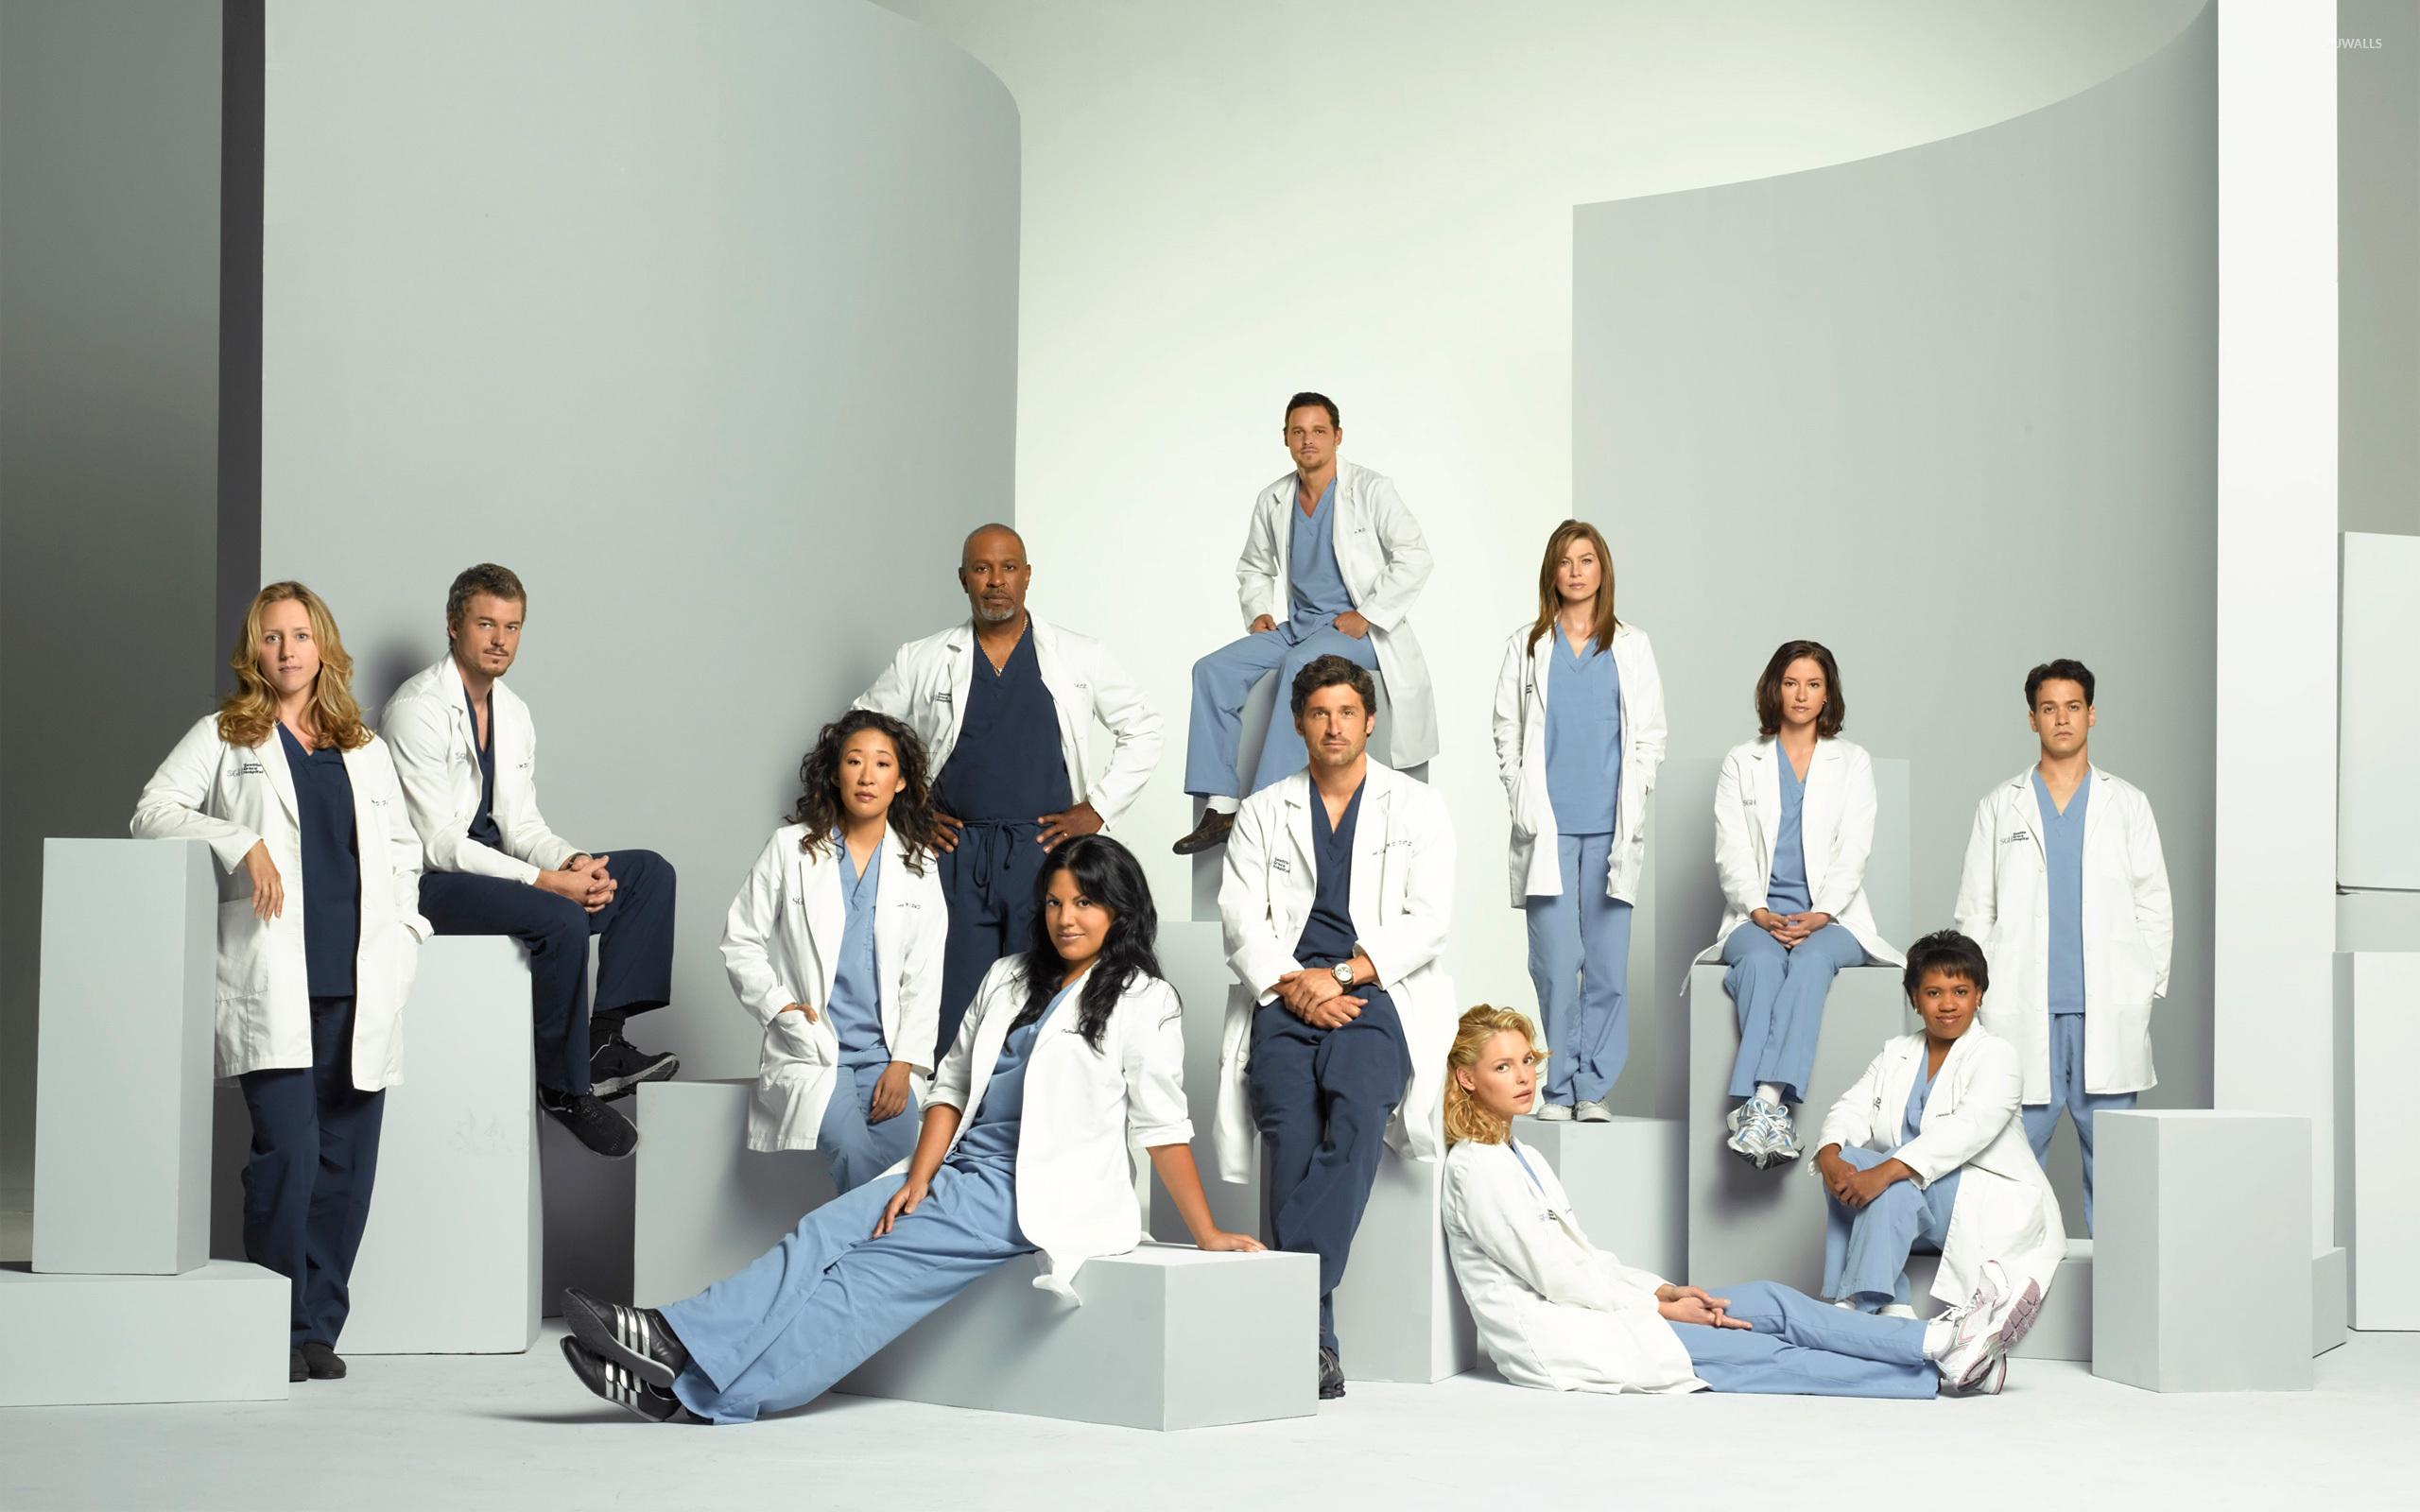 Gray anatomy tv show